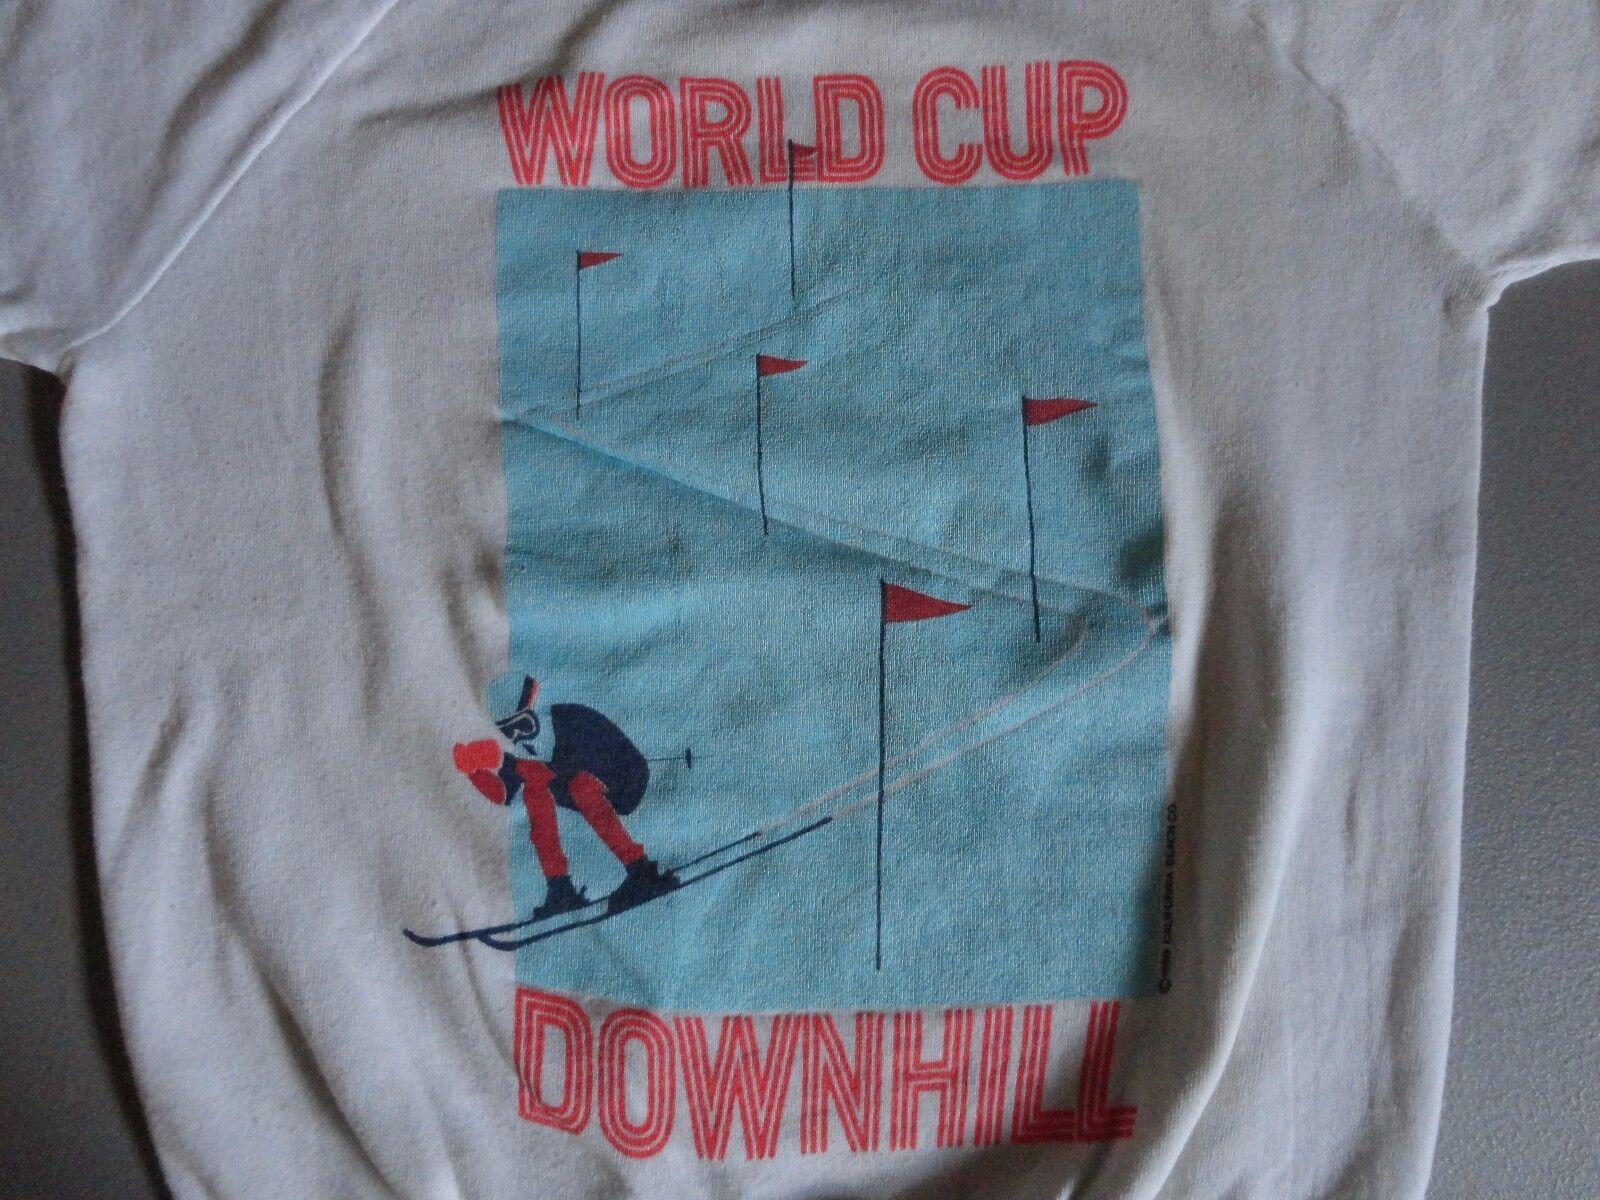 RARE Vintage USA 1986 World Cup Downhill Skiing 50-50 Sweatshirt Fits Adult S